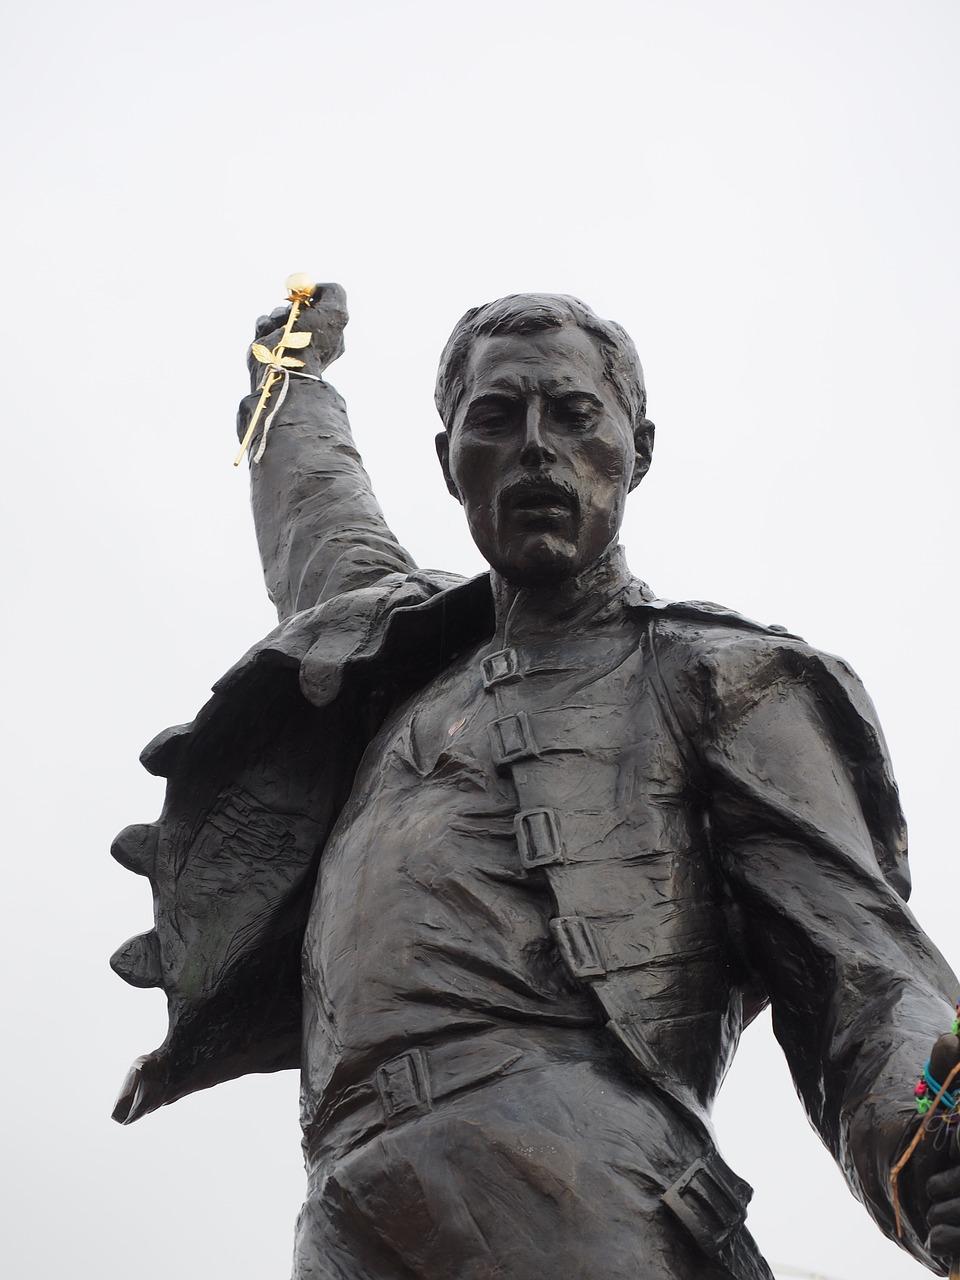 Legenda jménem Freddie Mercury